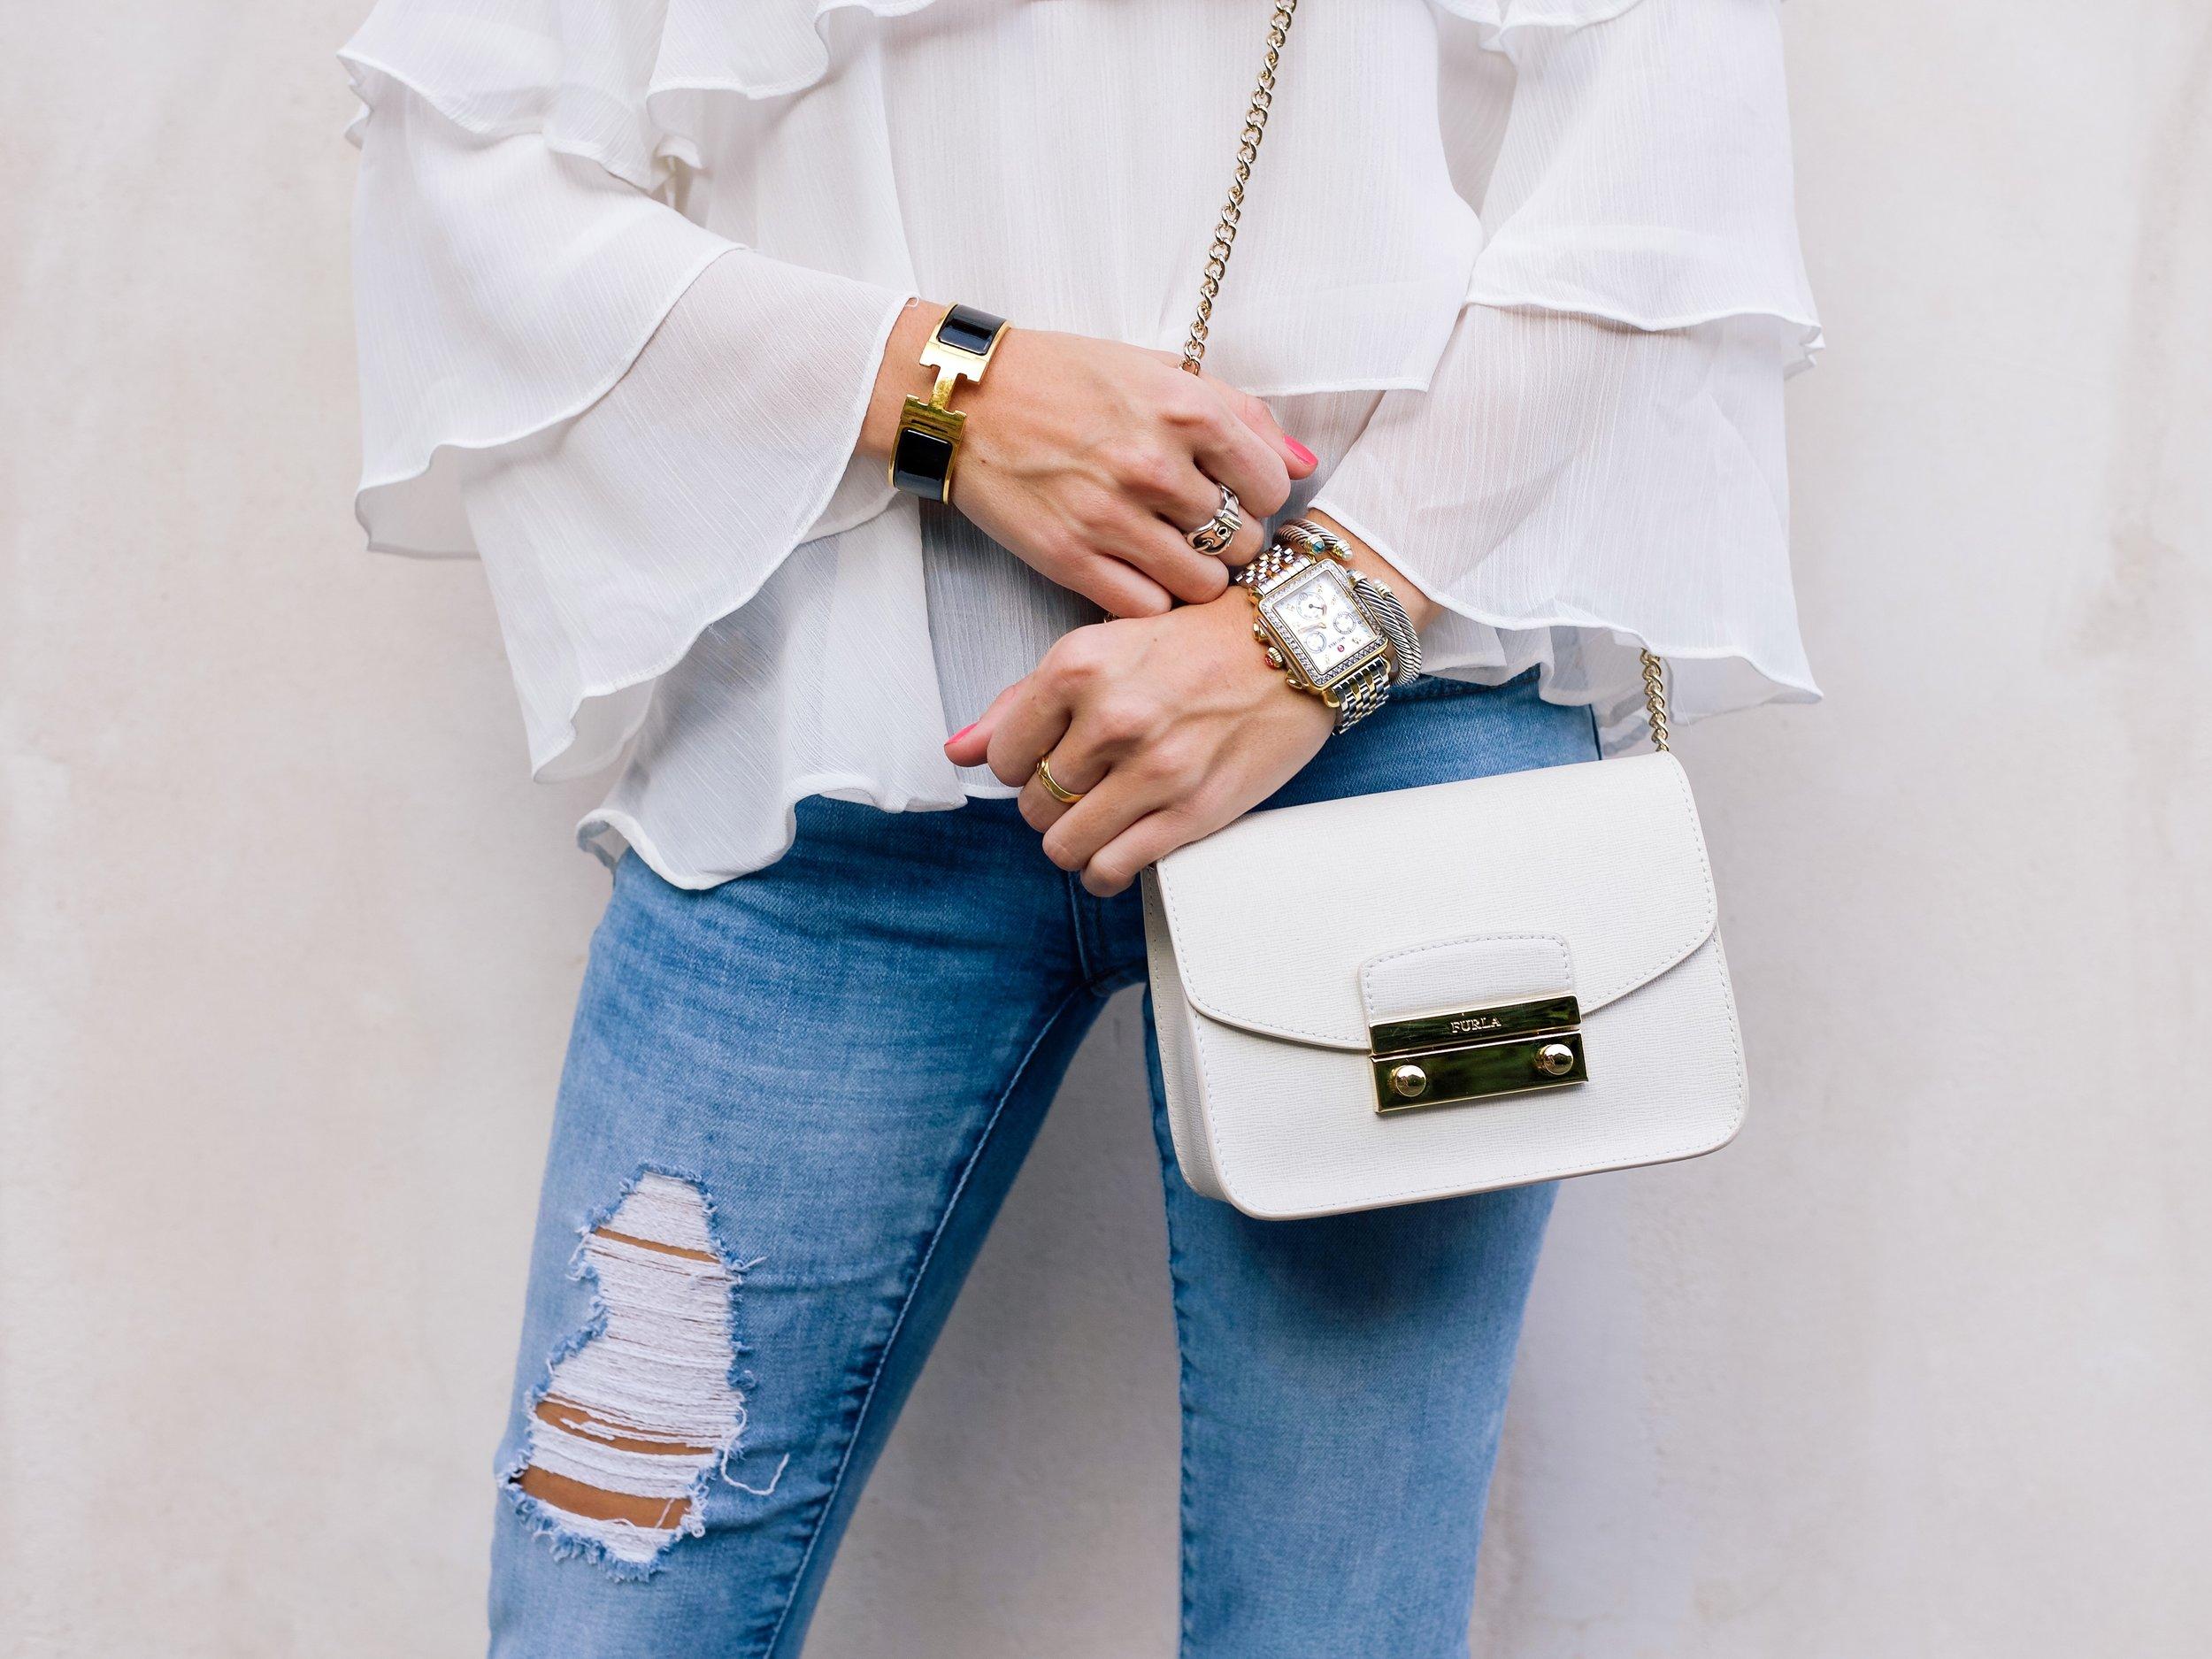 fashion blogger lcb style mignonne gavigan ruffle top schutz shoes (29 of 55)c.JPG